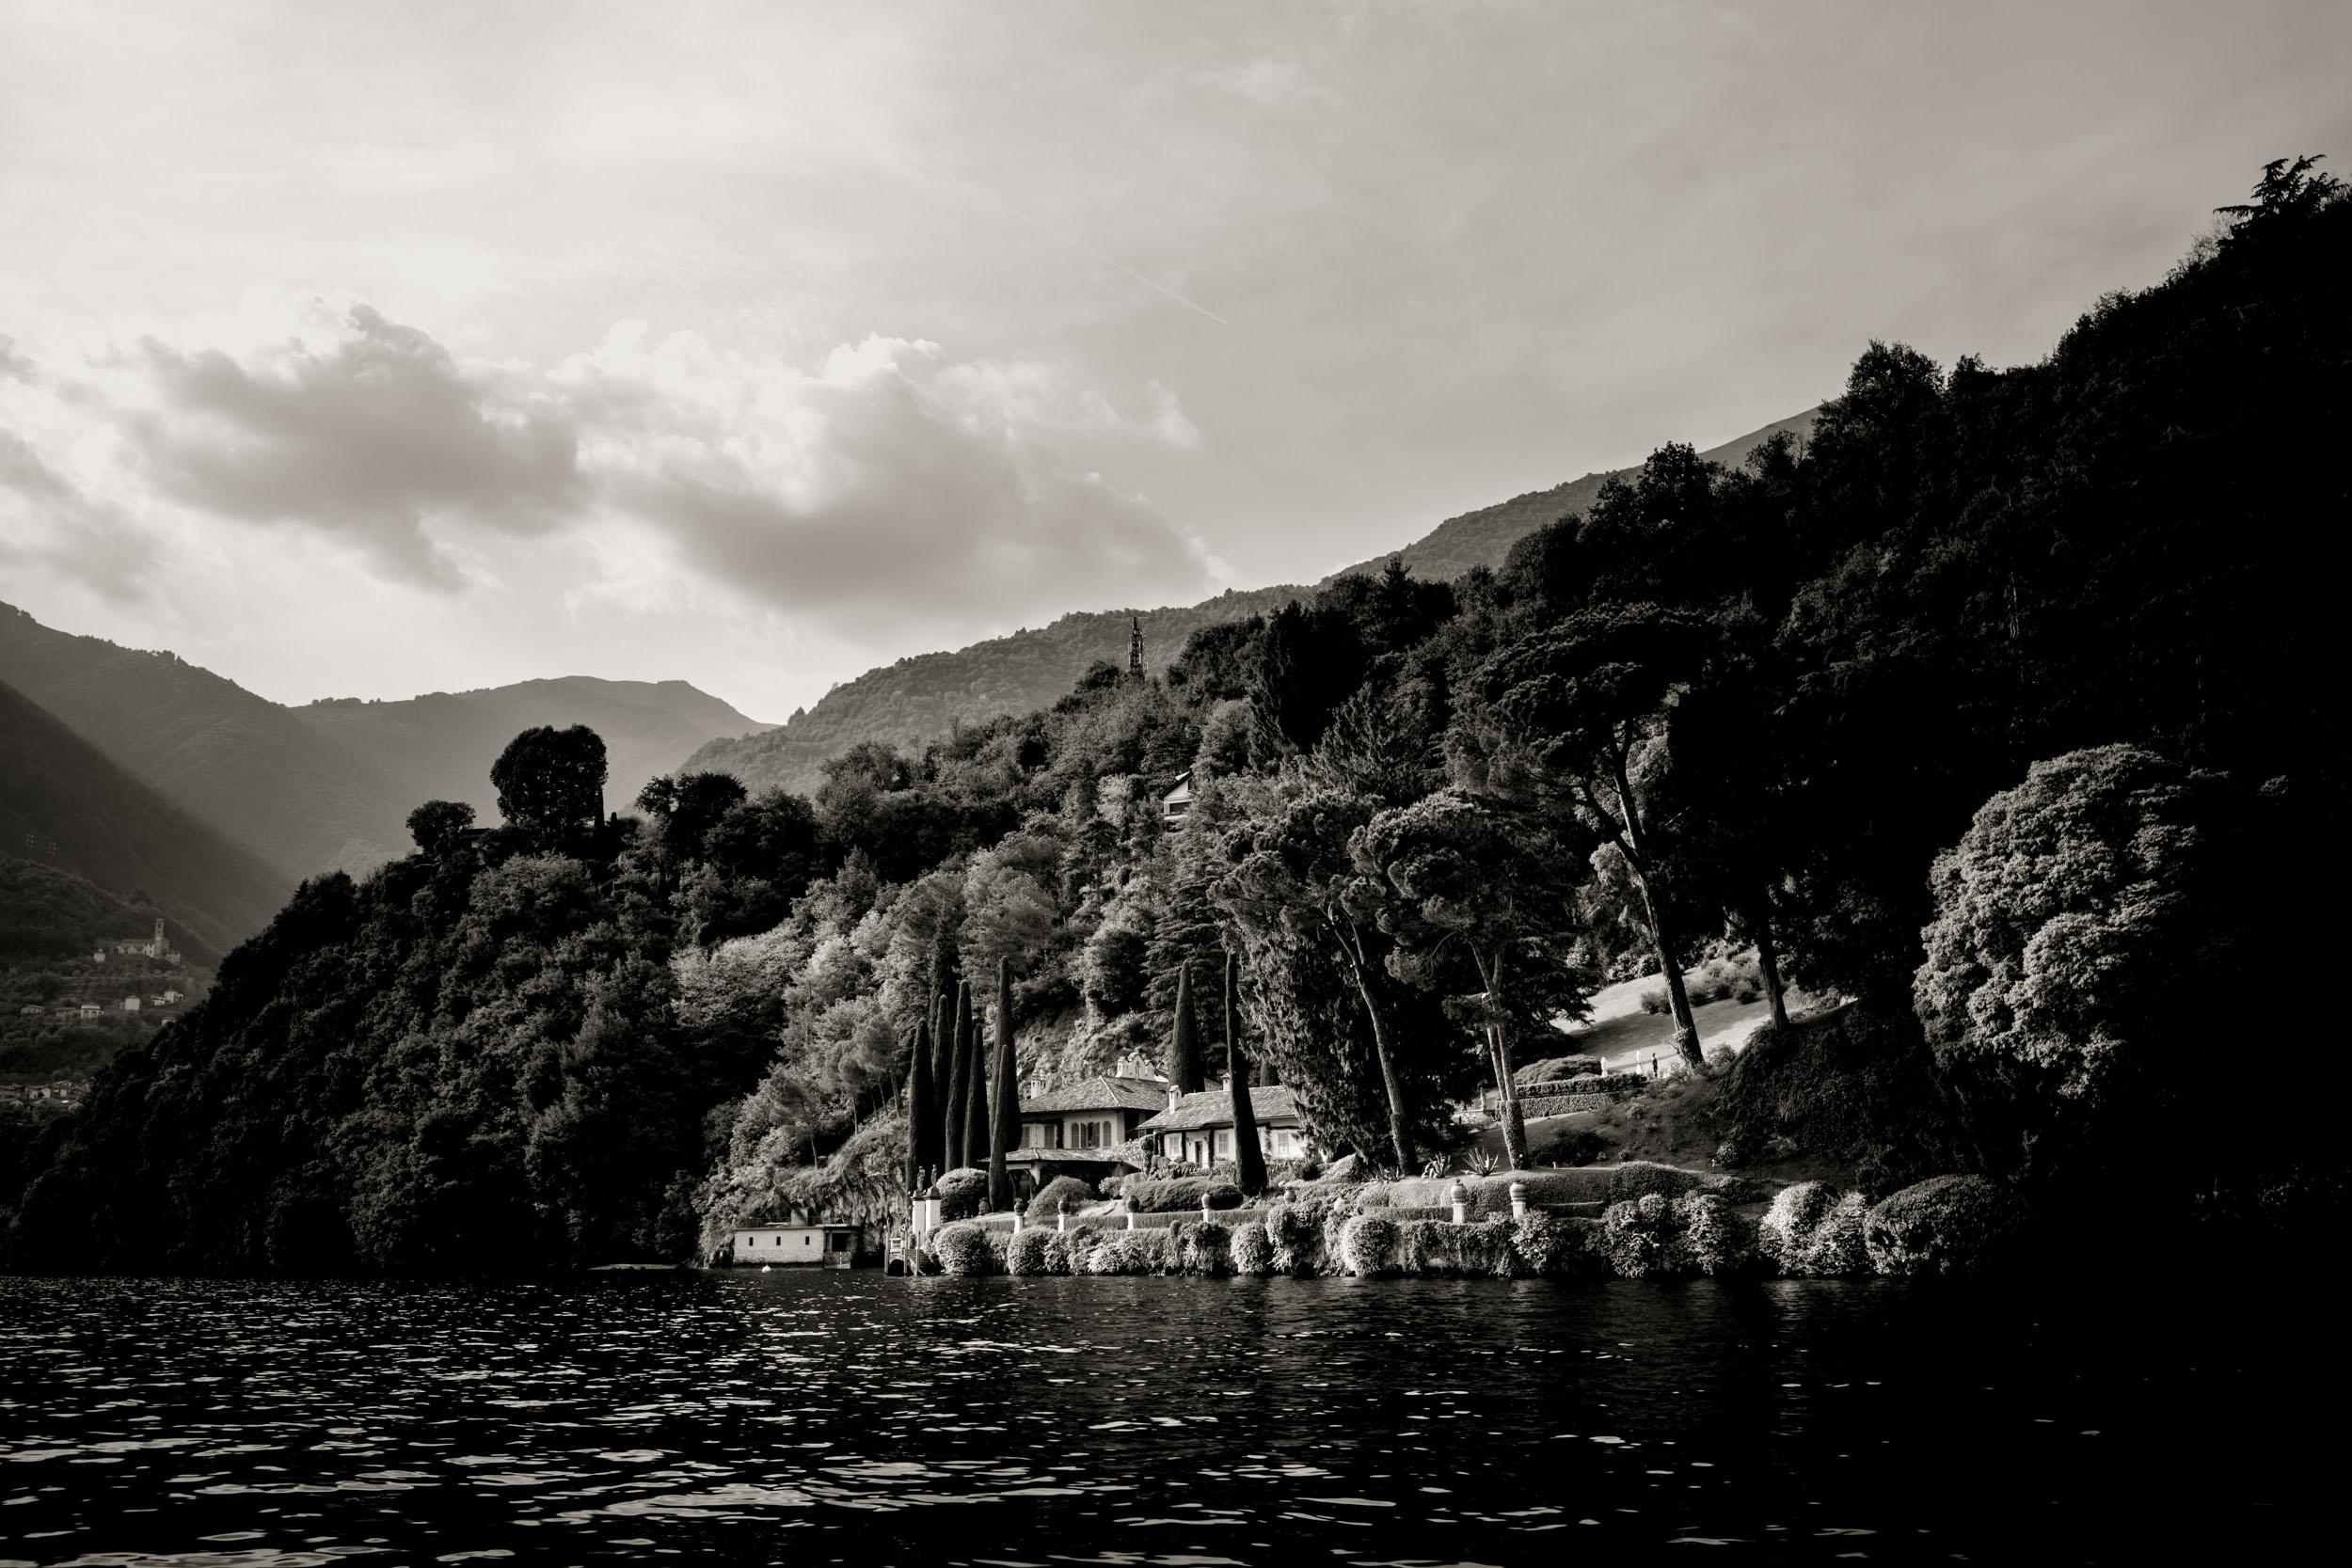 Luxury Lake Como Richard Branson house at Bellagio Photographer Bojan Hohnjec